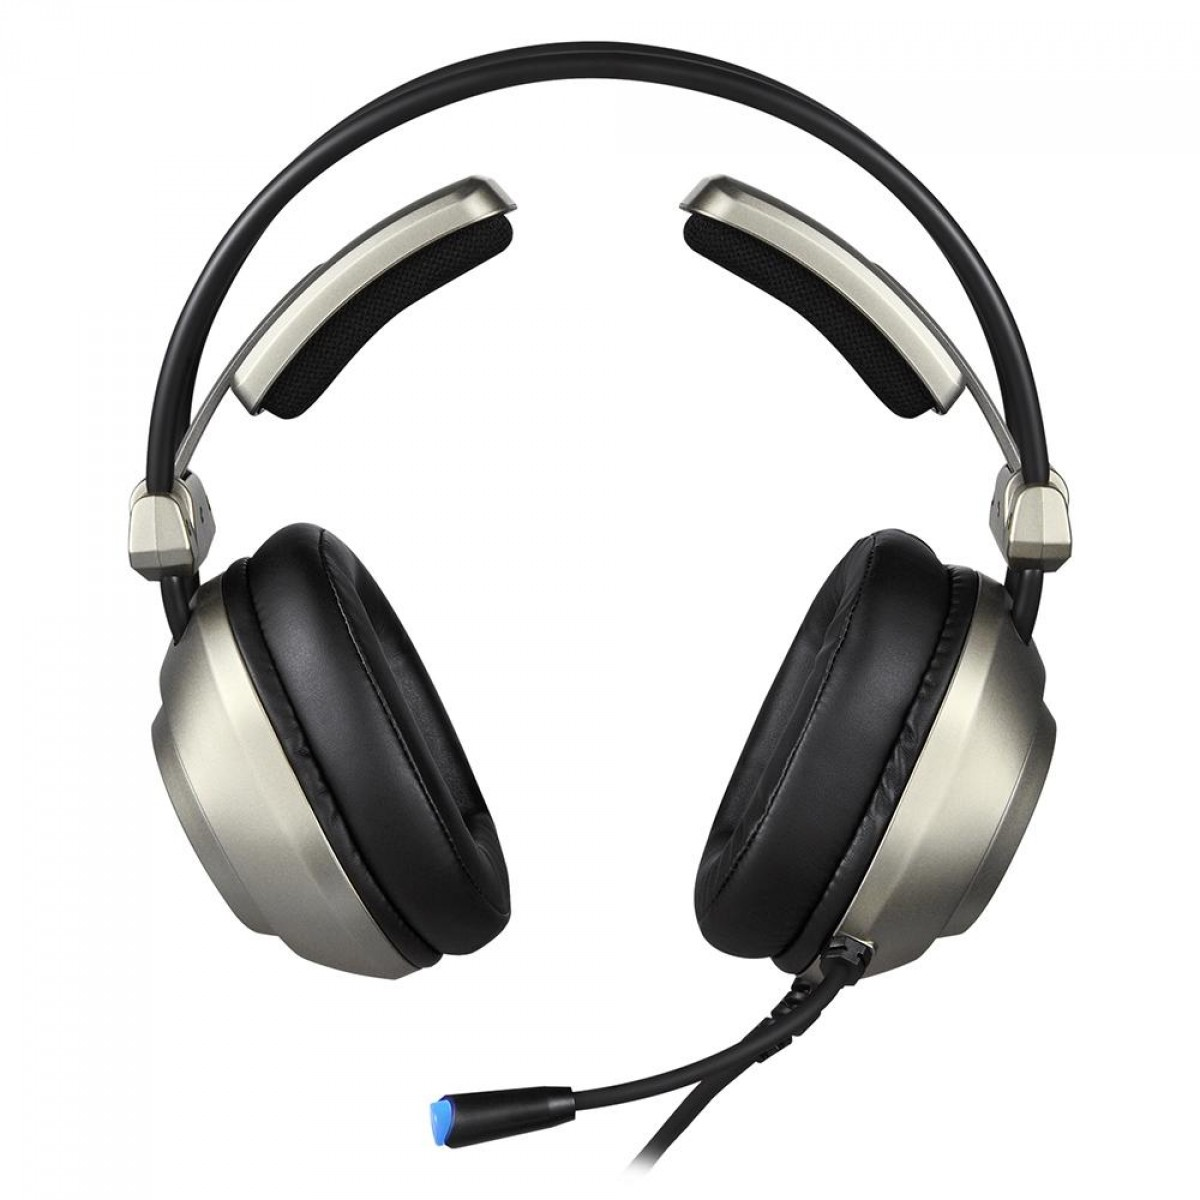 Headset Gamer Motospeed H19, USB, PC, Gray, FMSHS0105CIZ